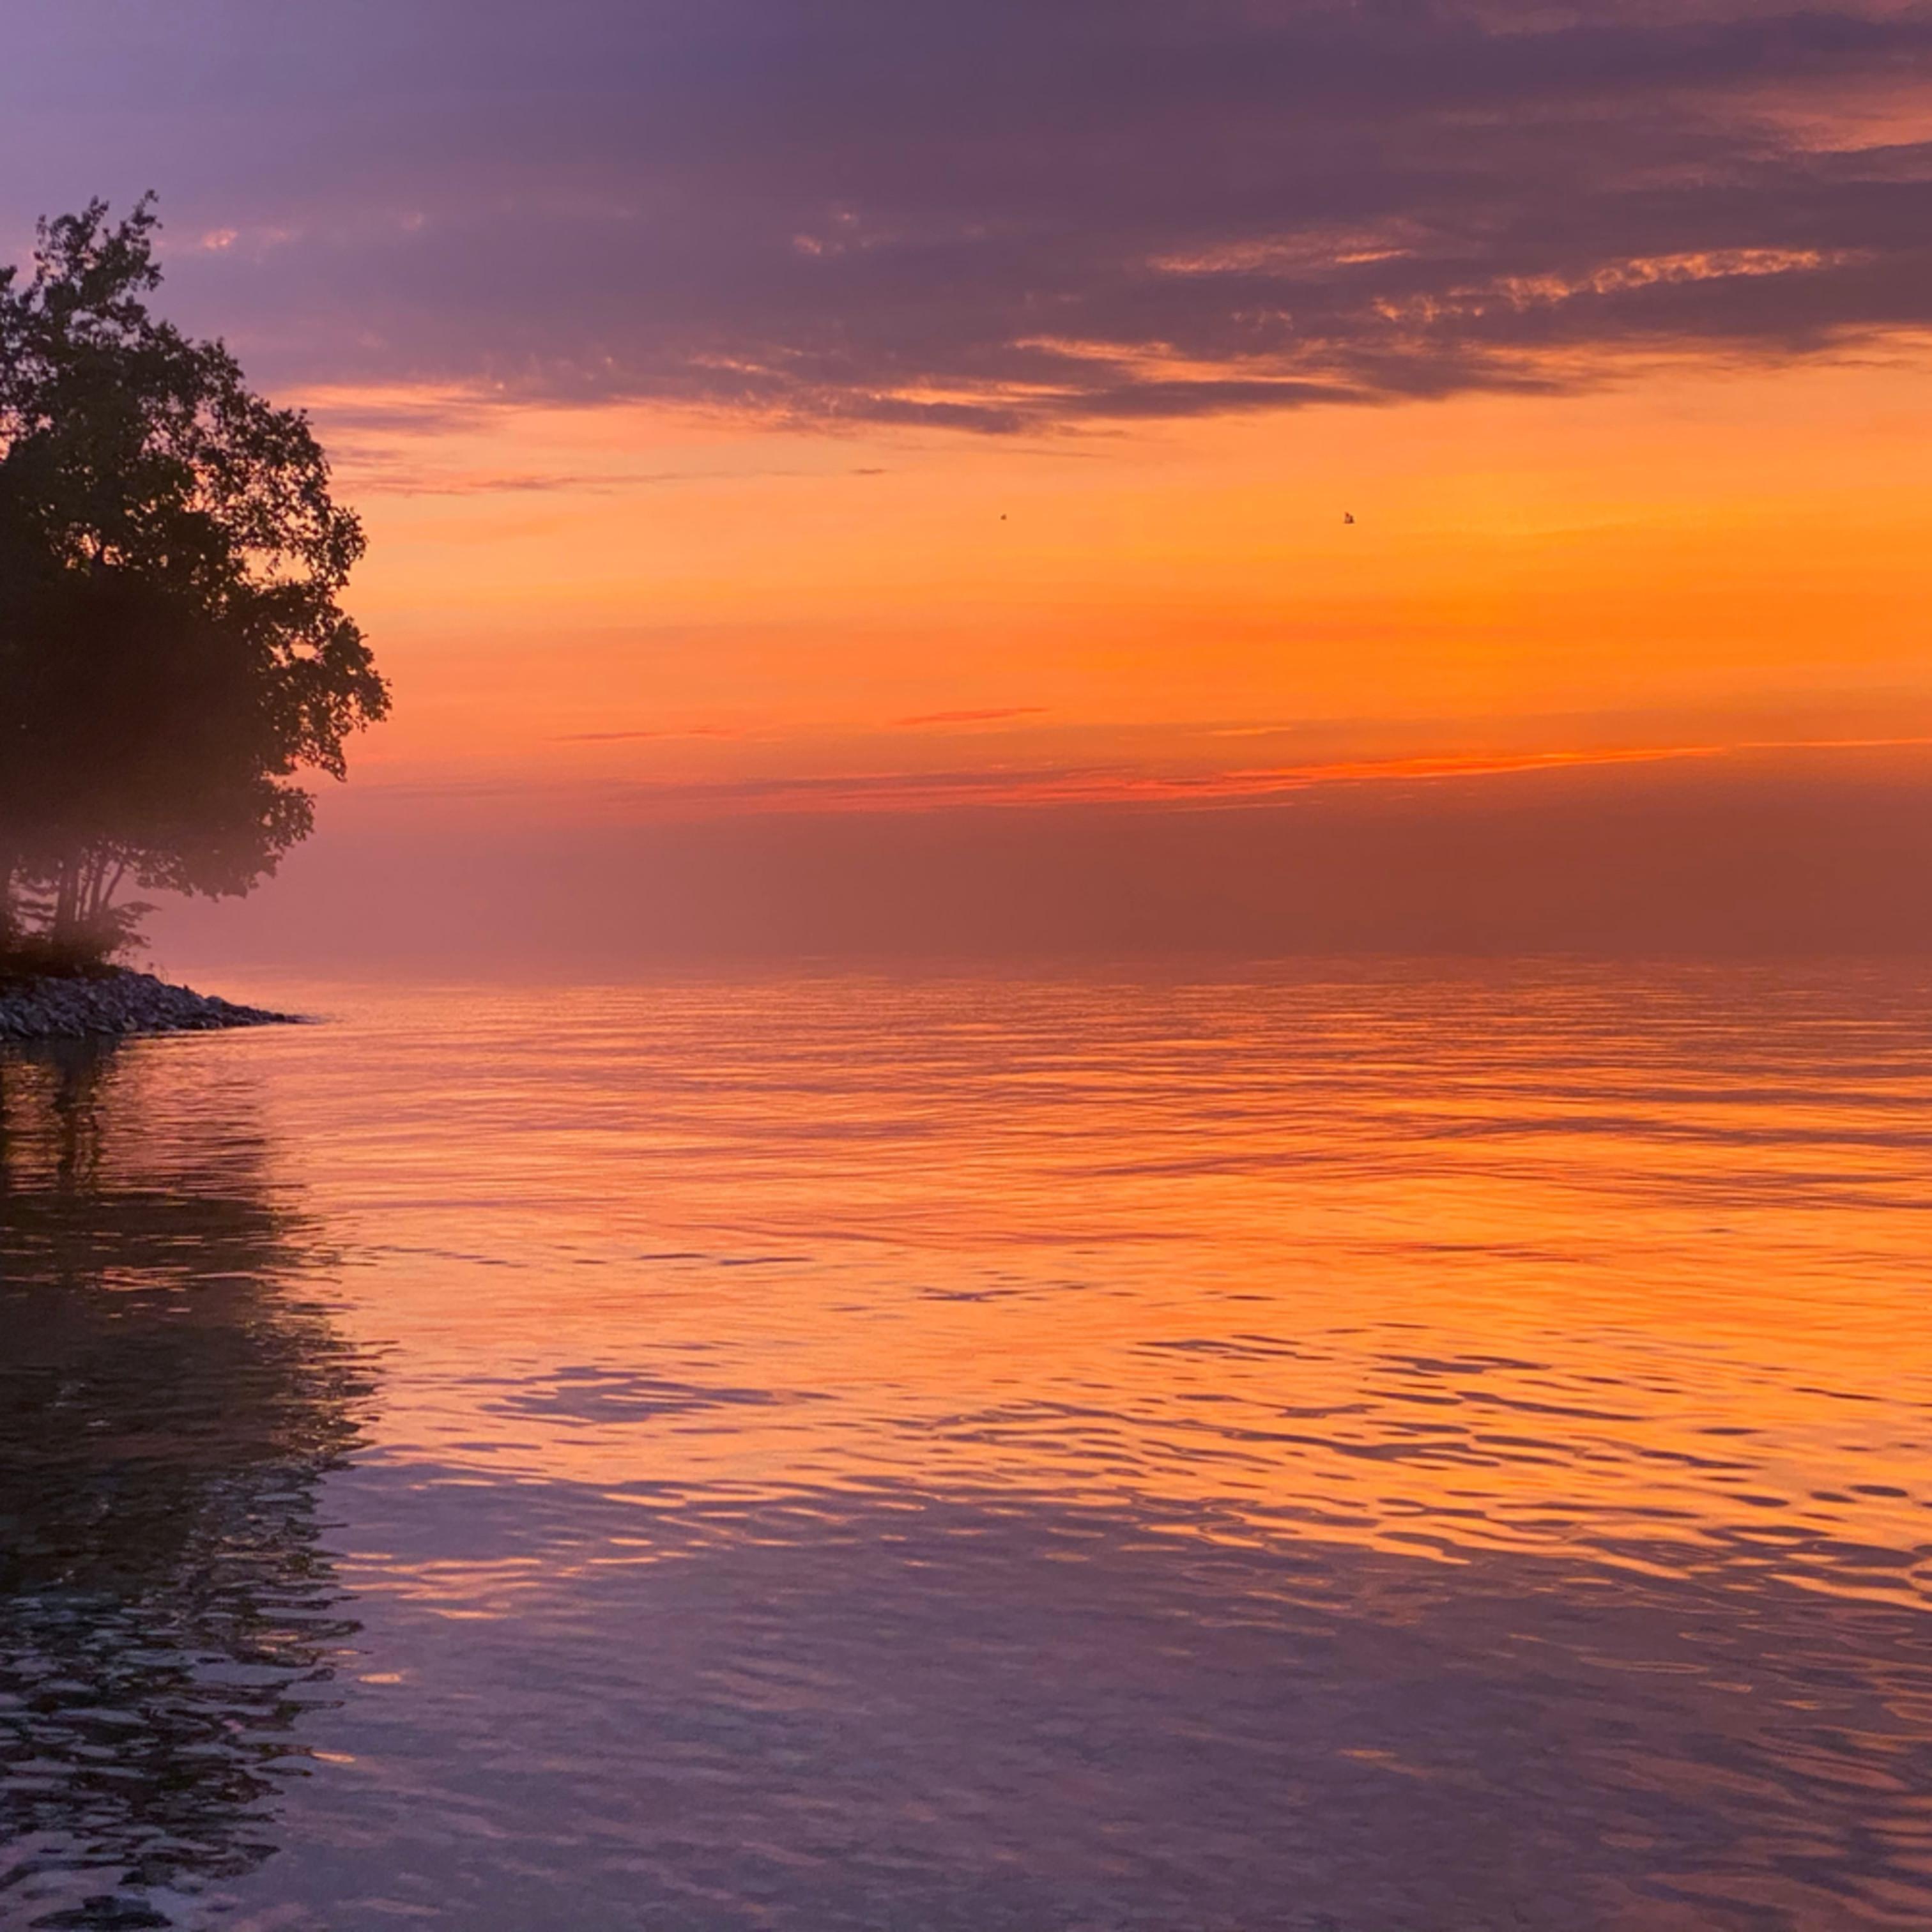 Solstice daybreak mnhect